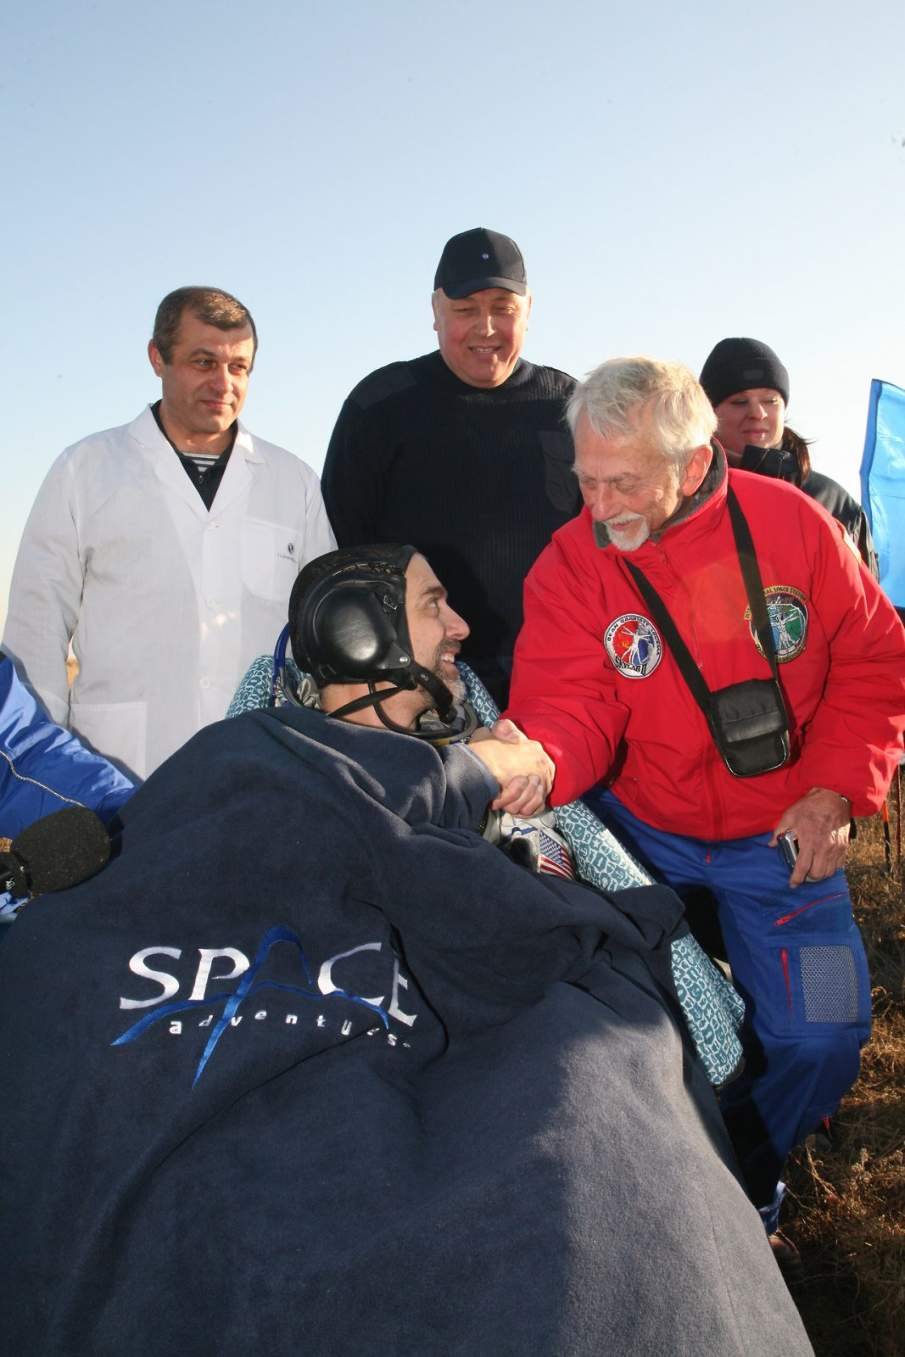 Disparition de l'astronaute américain Owen Garriott